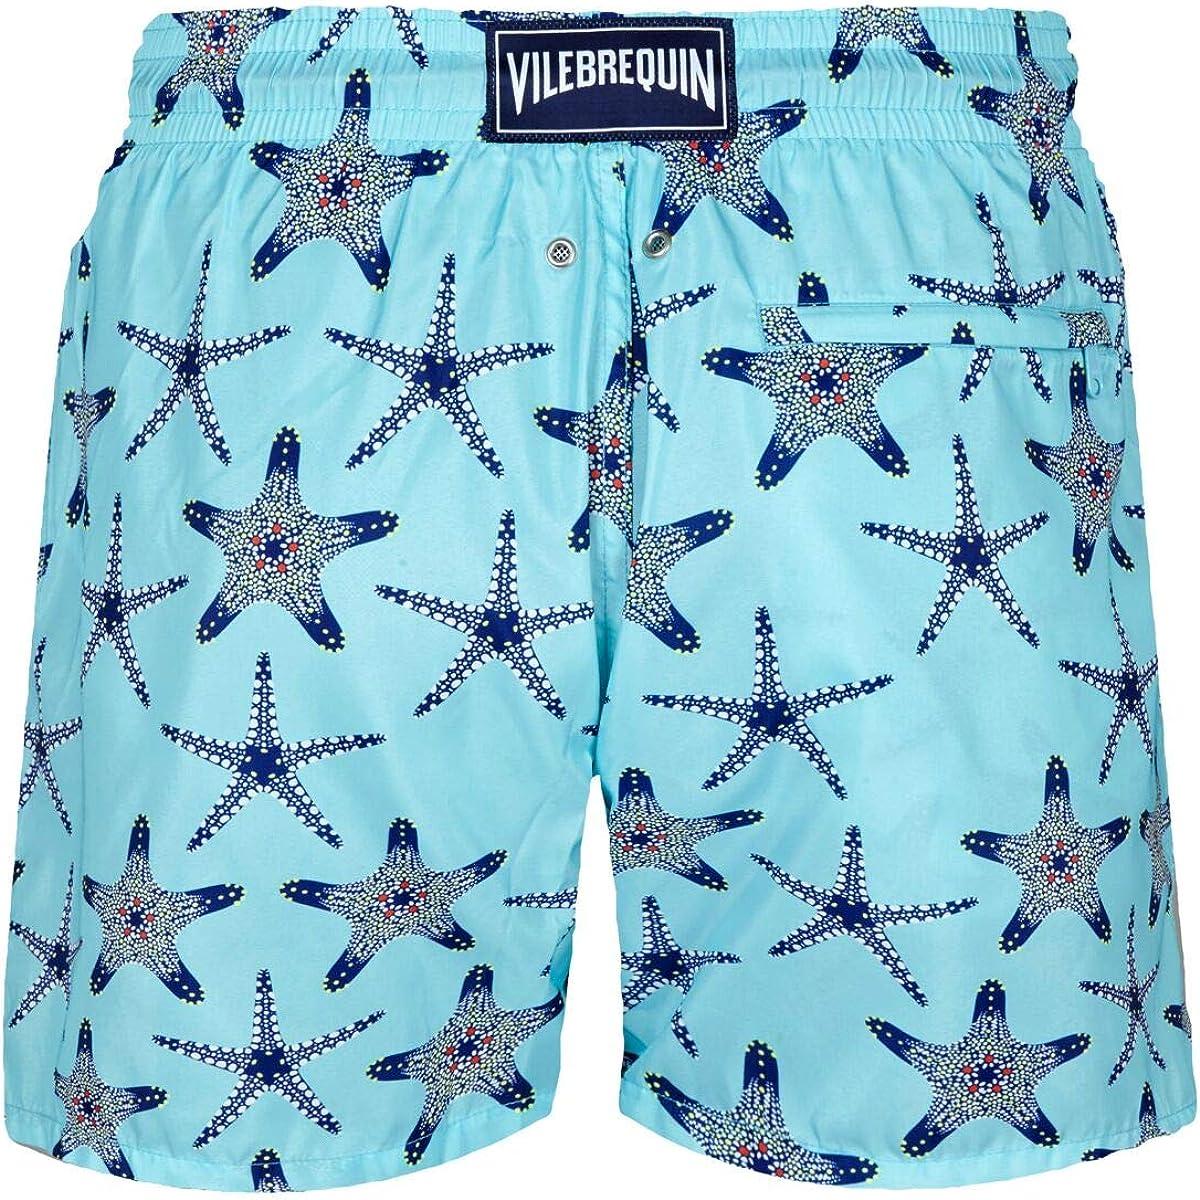 Vilebrequin Men Swimwear Ultra-Light and Packable Starfish Dance